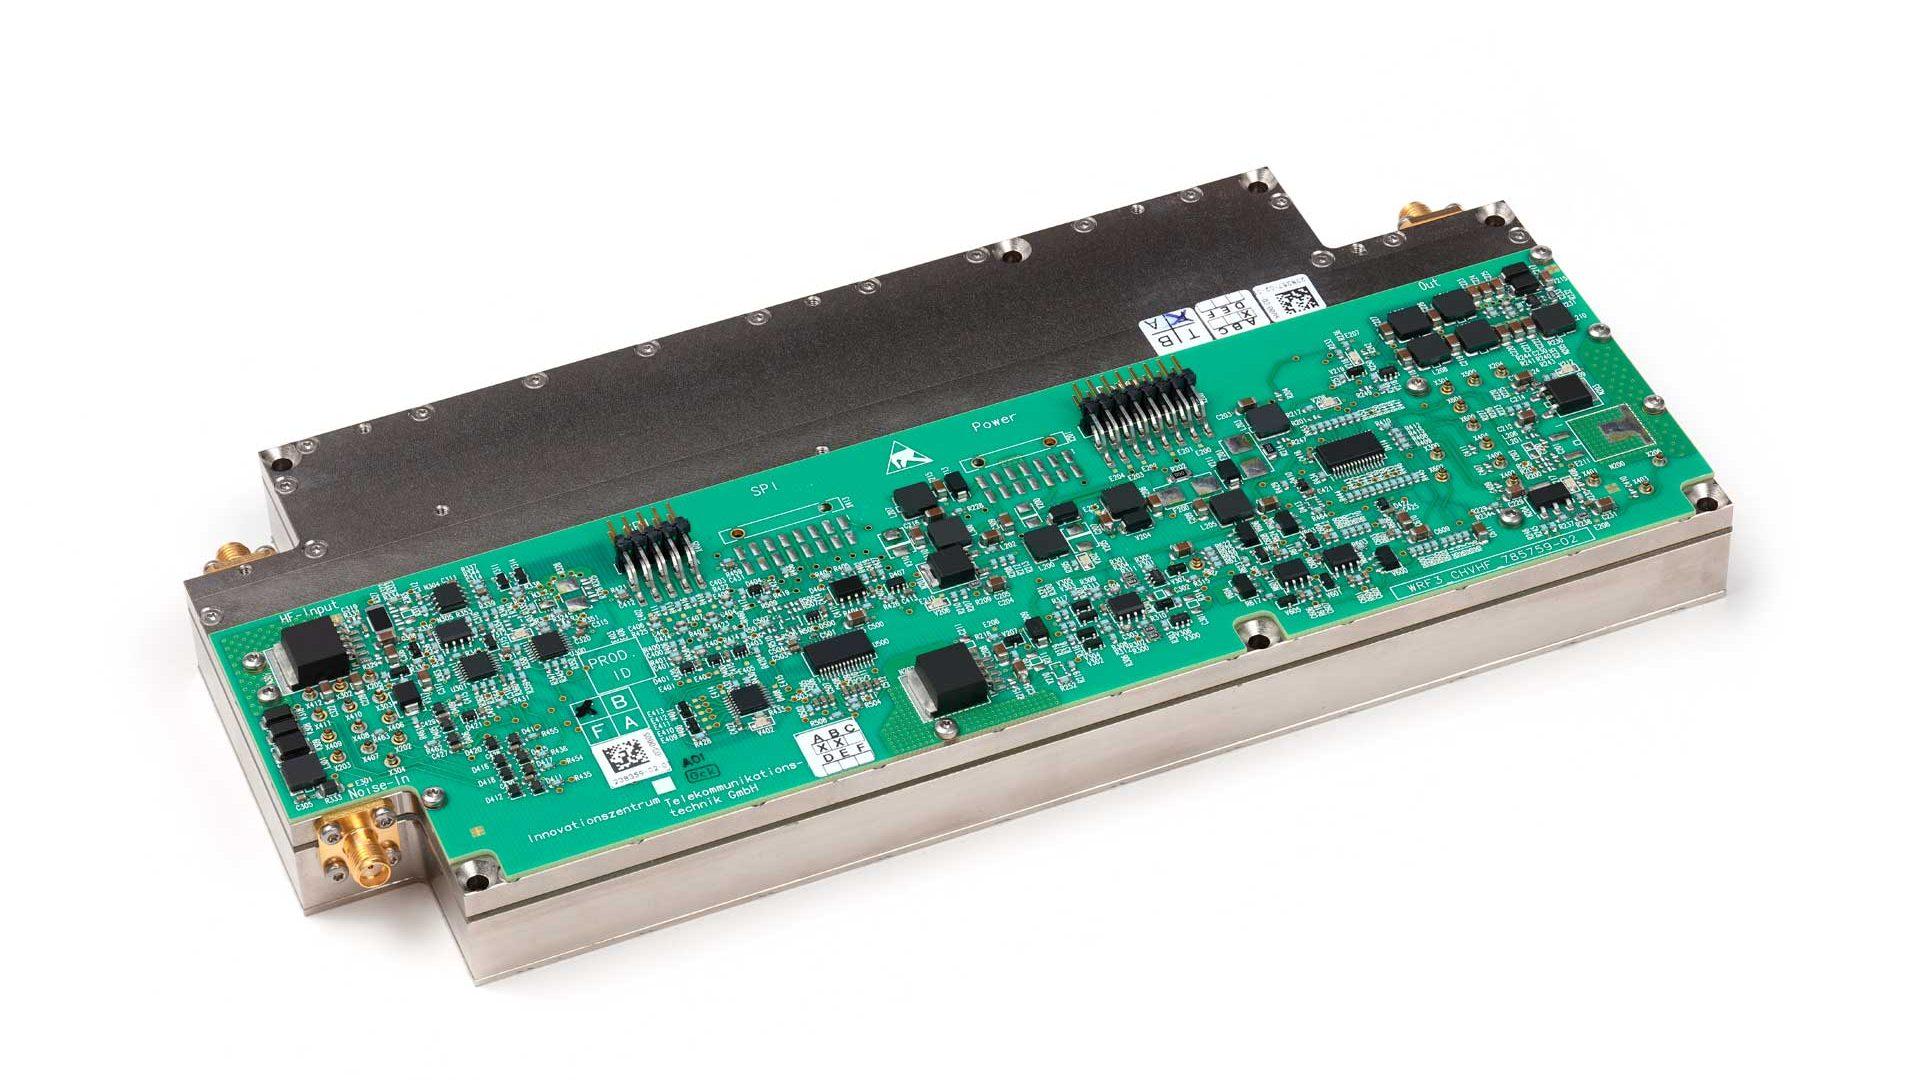 IZT R3500 Ultimate Sensor for Intercepting HF Signals circuit board